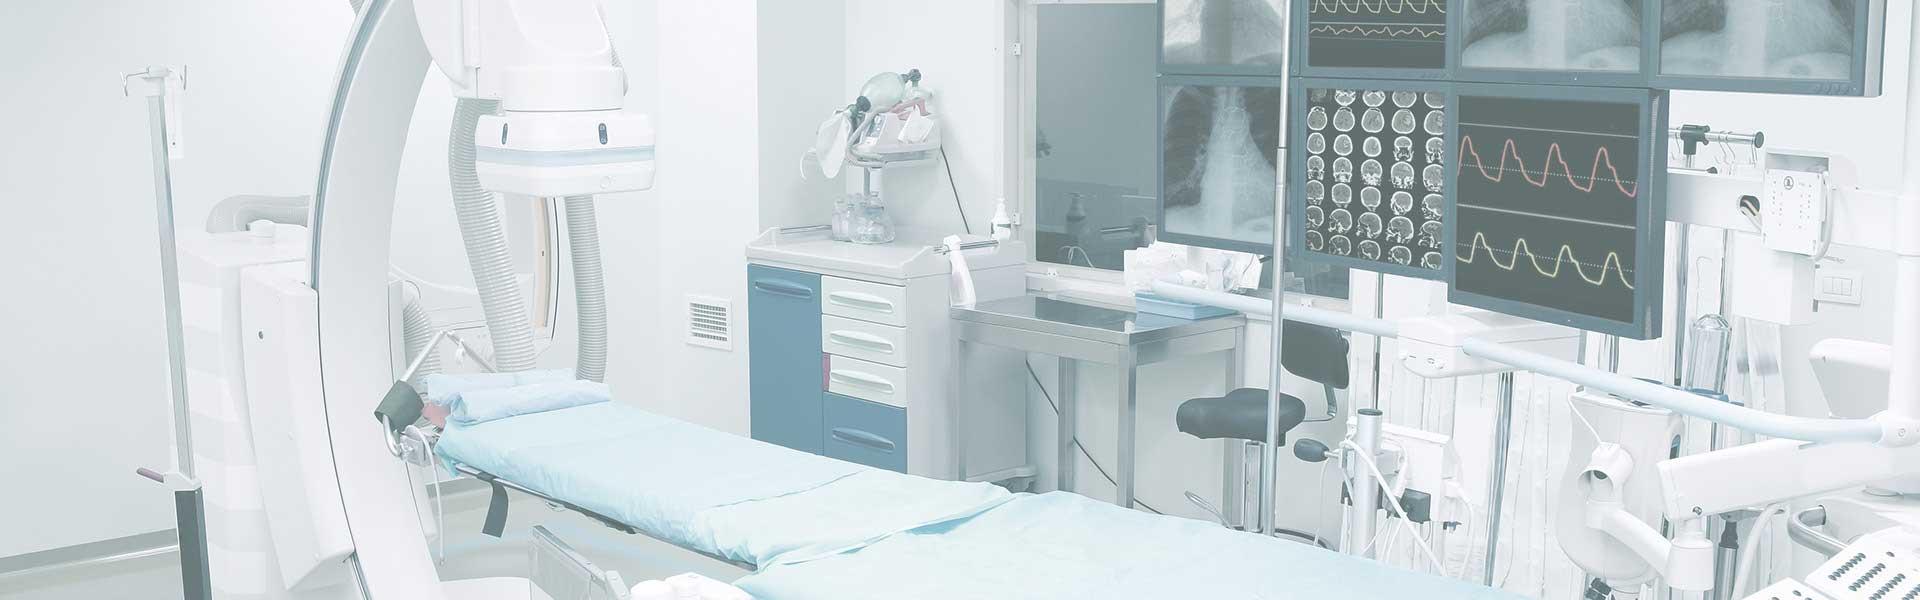 Medicinsk udstyr